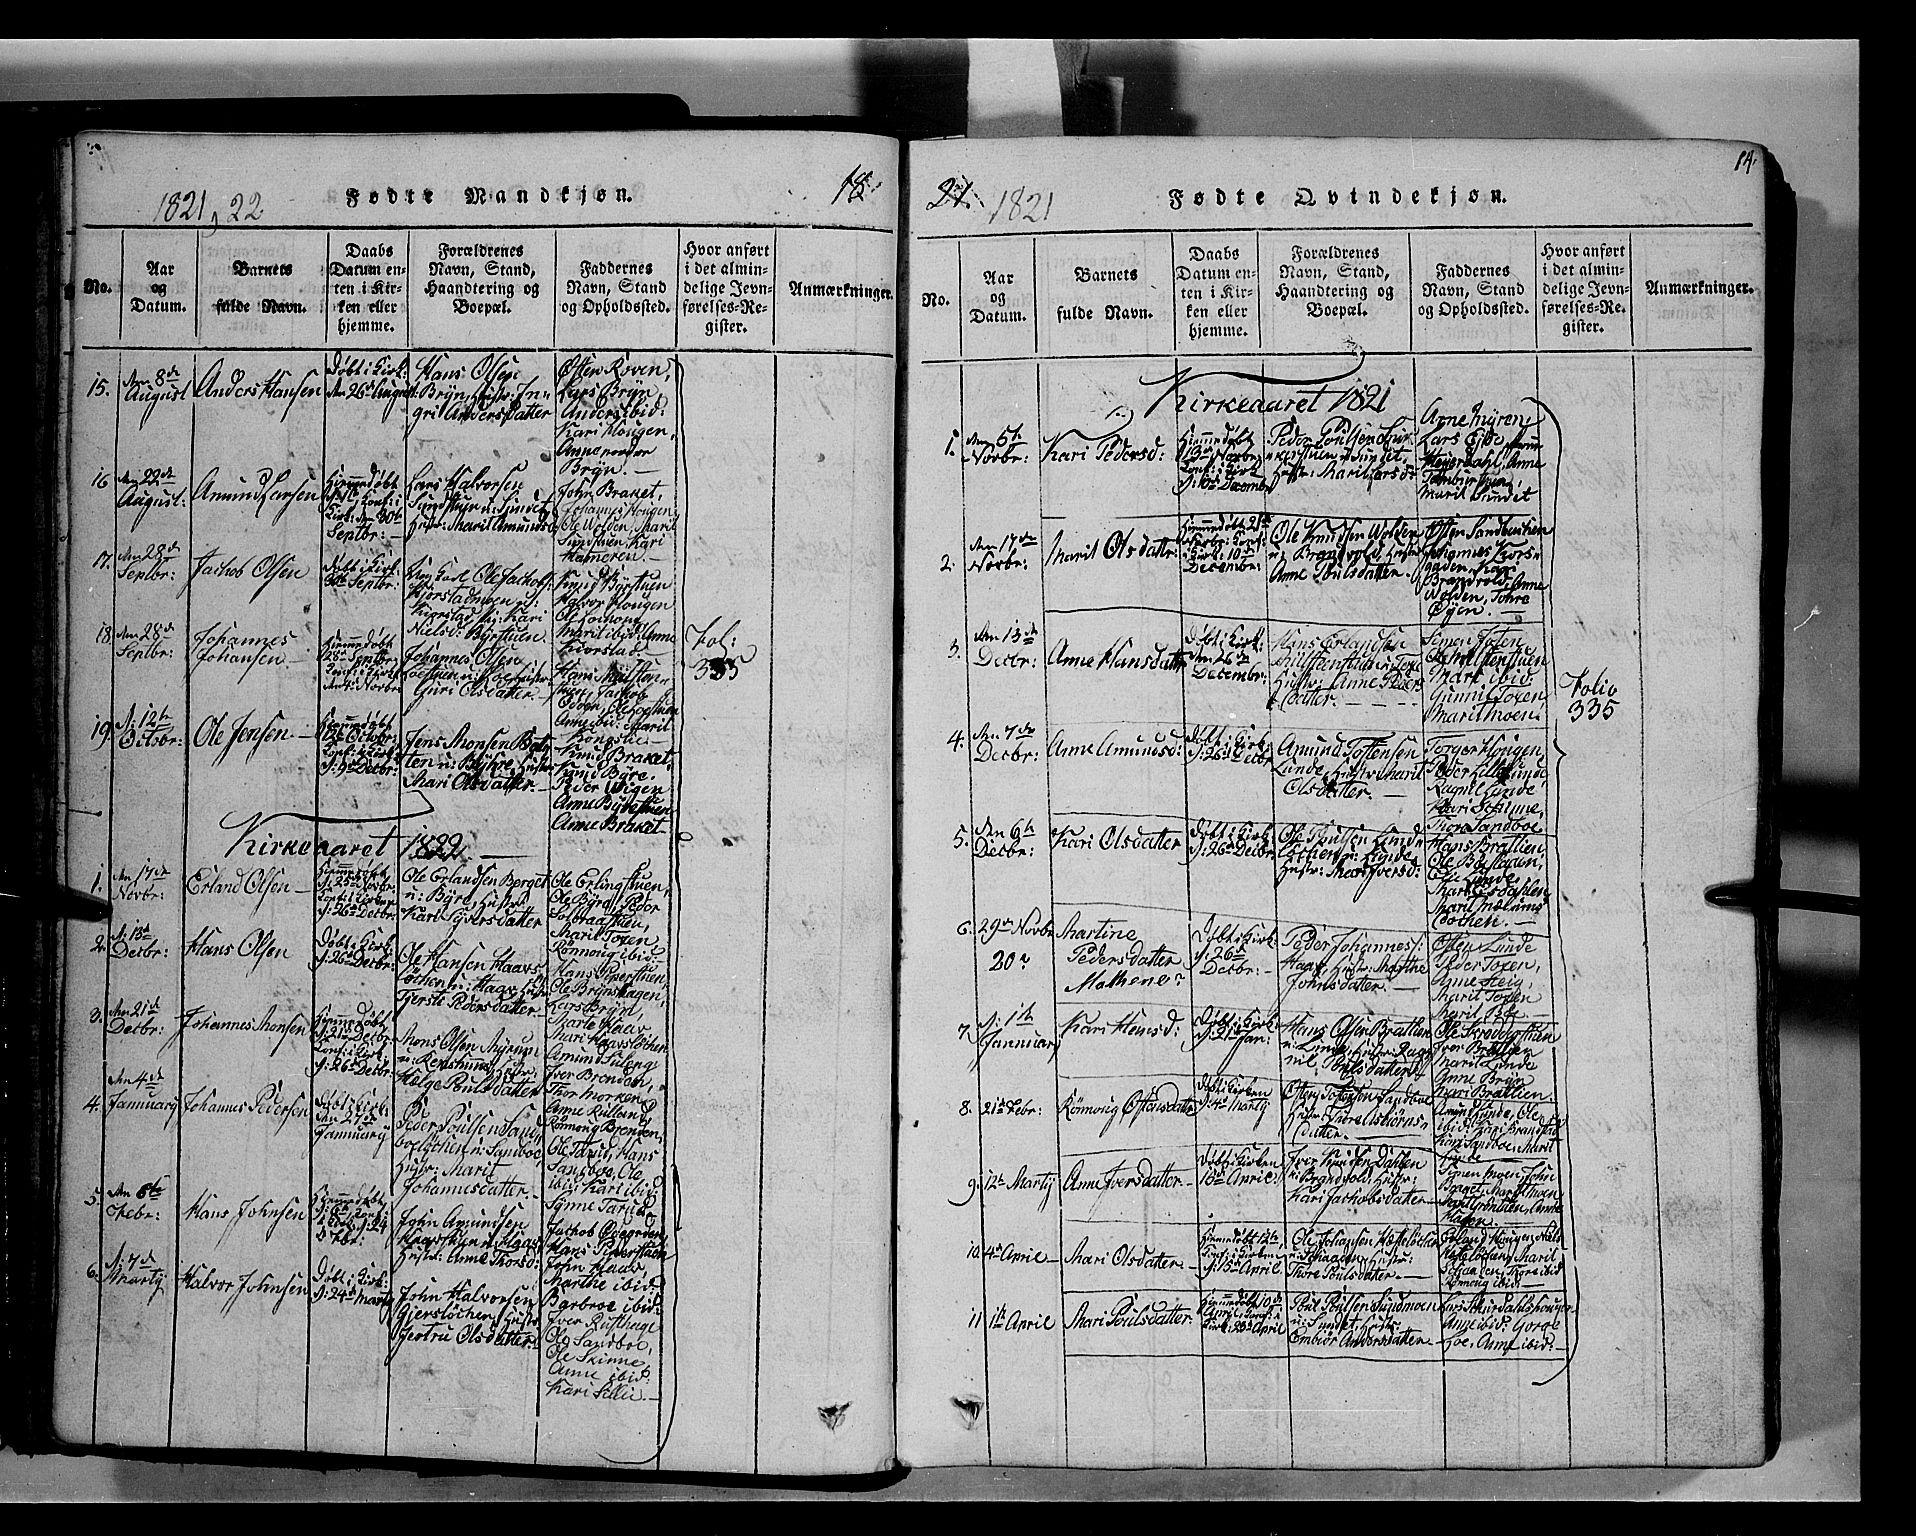 SAH, Fron prestekontor, H/Ha/Hab/L0004: Klokkerbok nr. 4, 1816-1850, s. 14